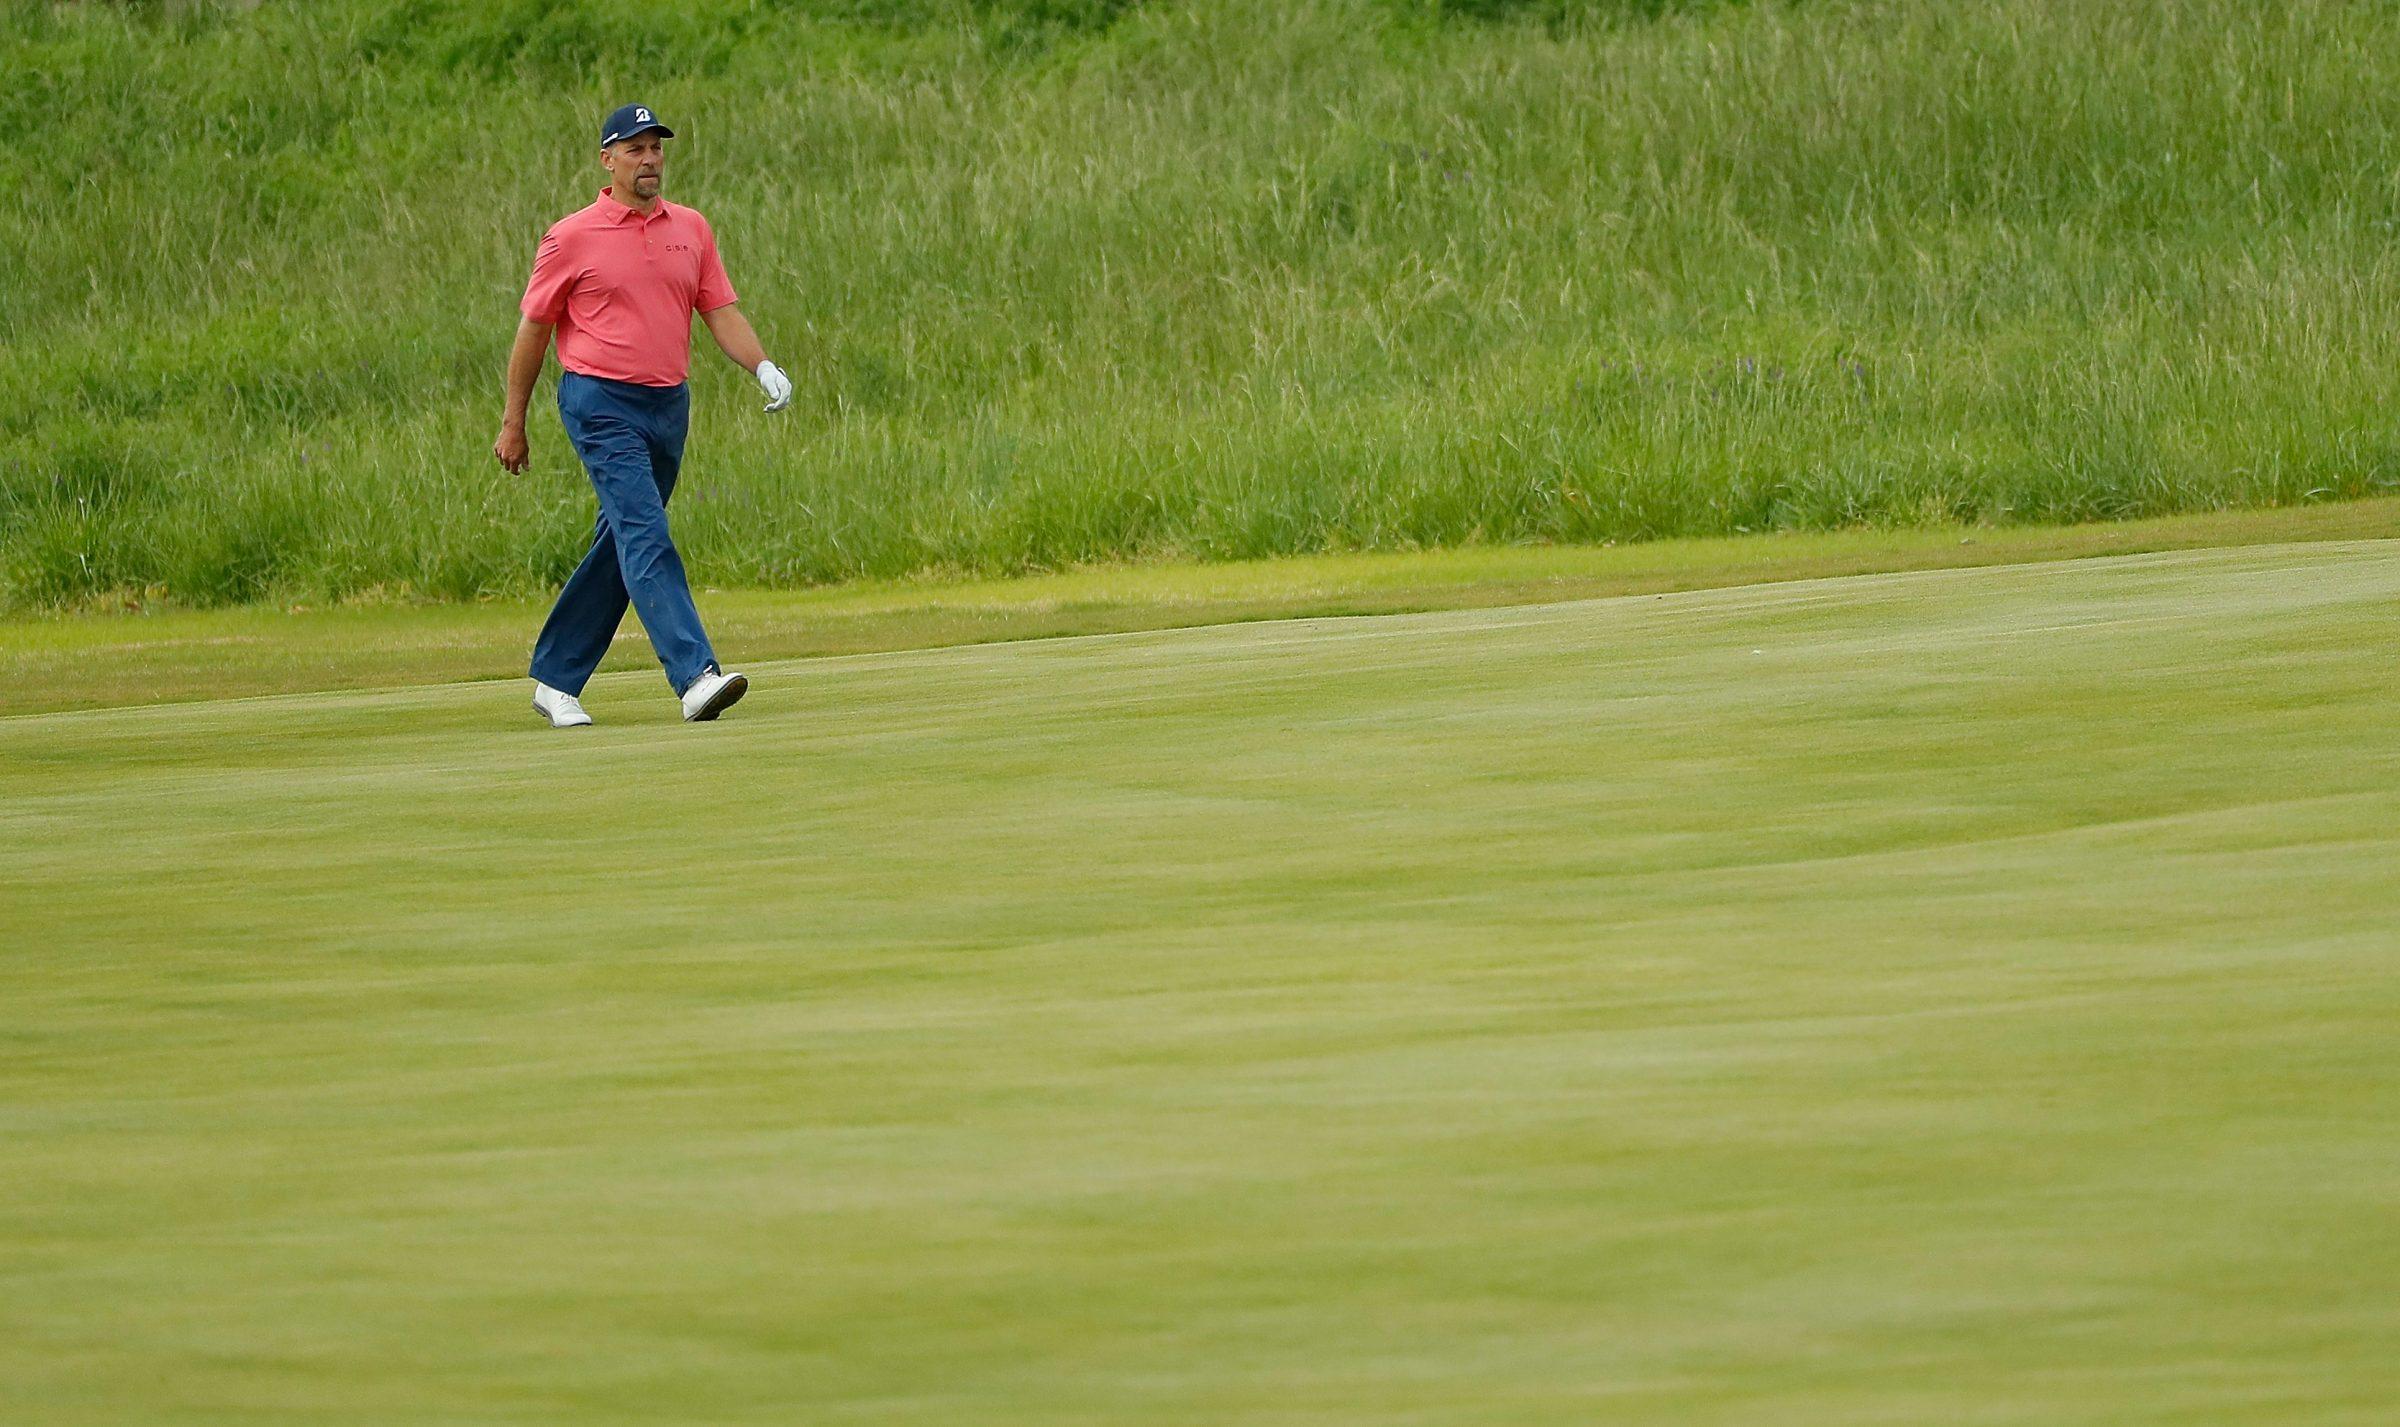 John Smoltz plays some golf.